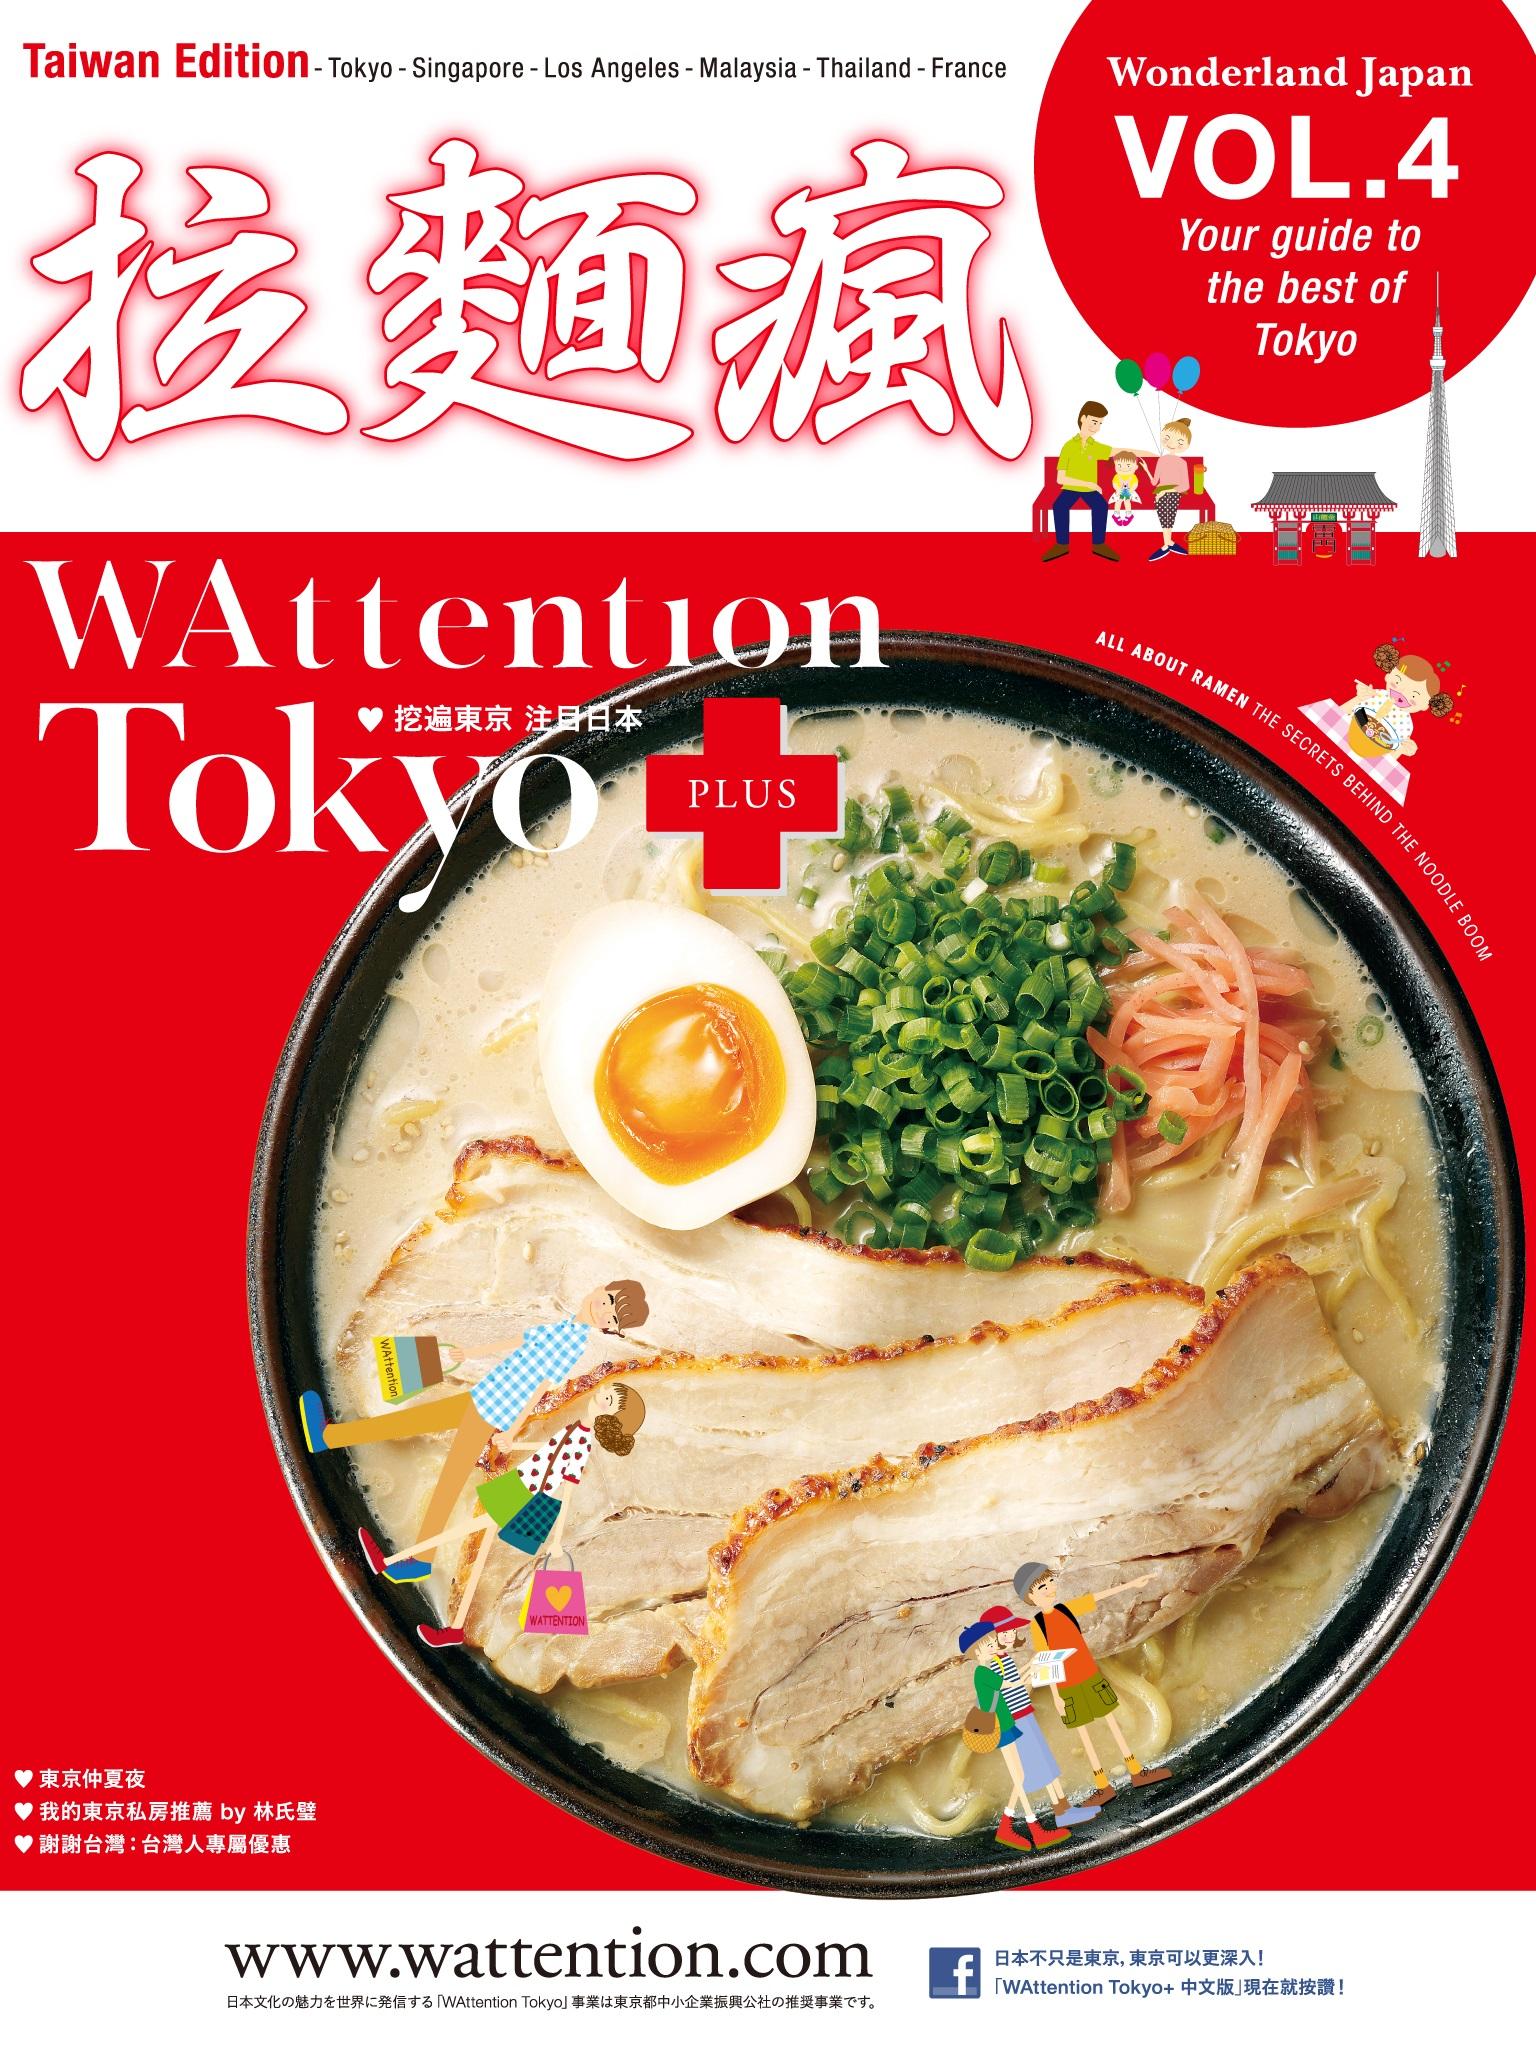 【繁体字版】拉麺瘋/ WAttention Tokyo (Taiwan Edition) vol. 04